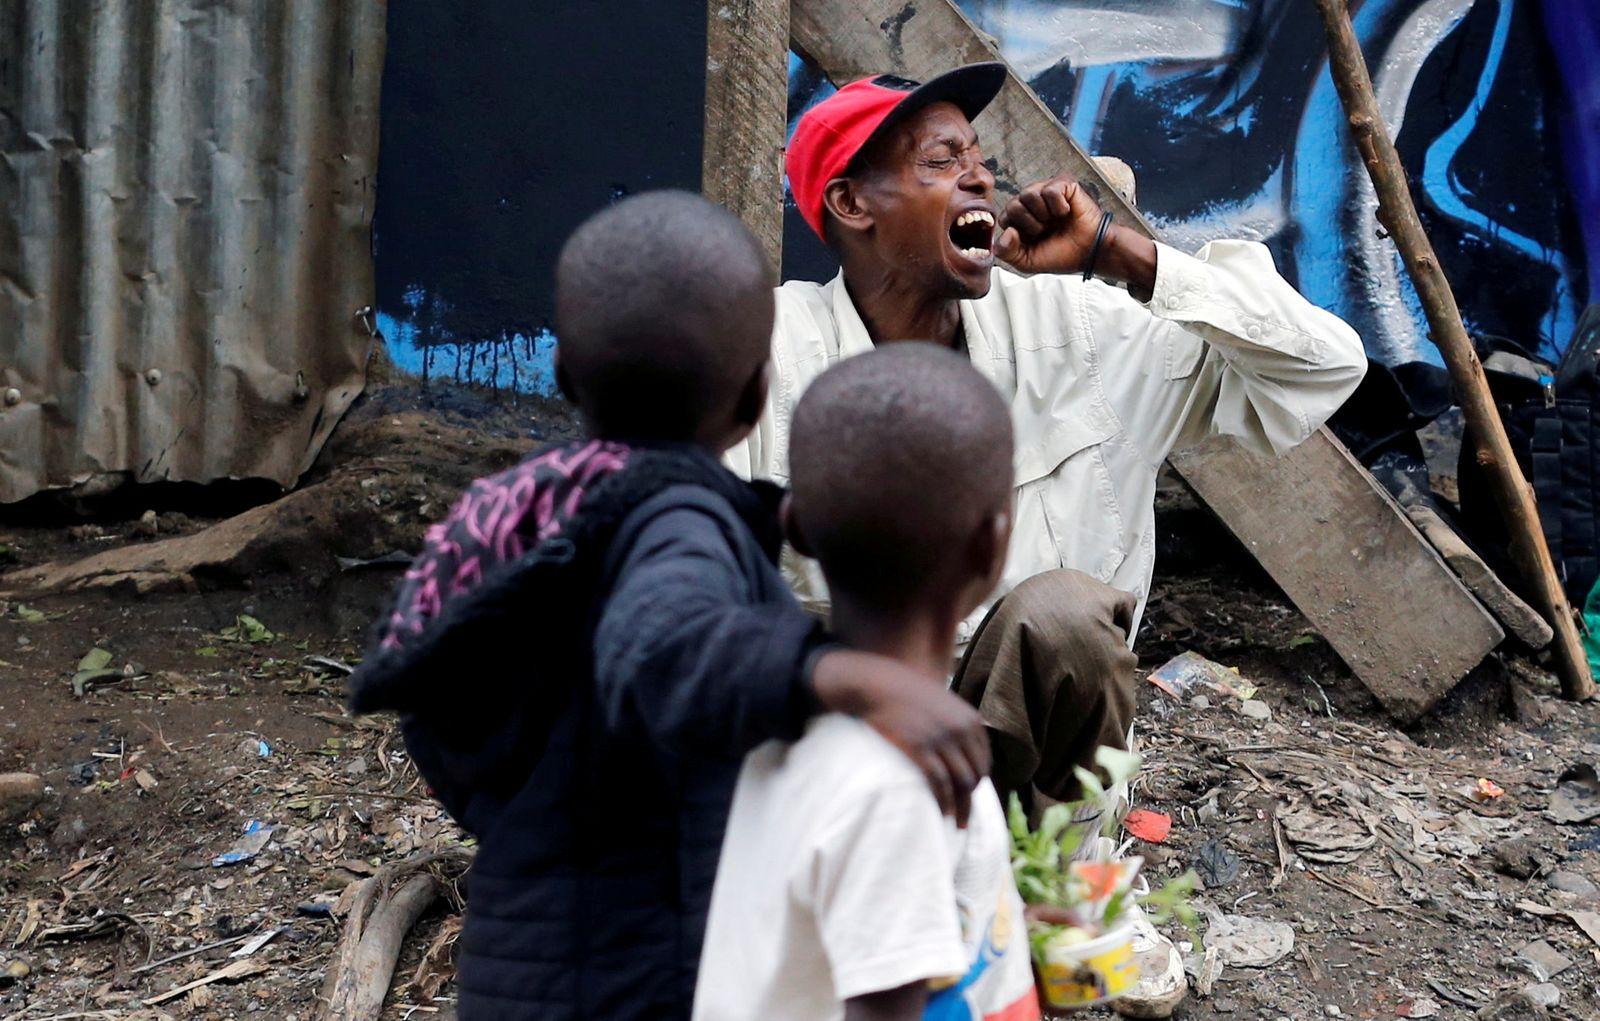 A man coughs as children walk past roadside, amid the spread of the coronavirus disease (COVID-19) in Nairobi